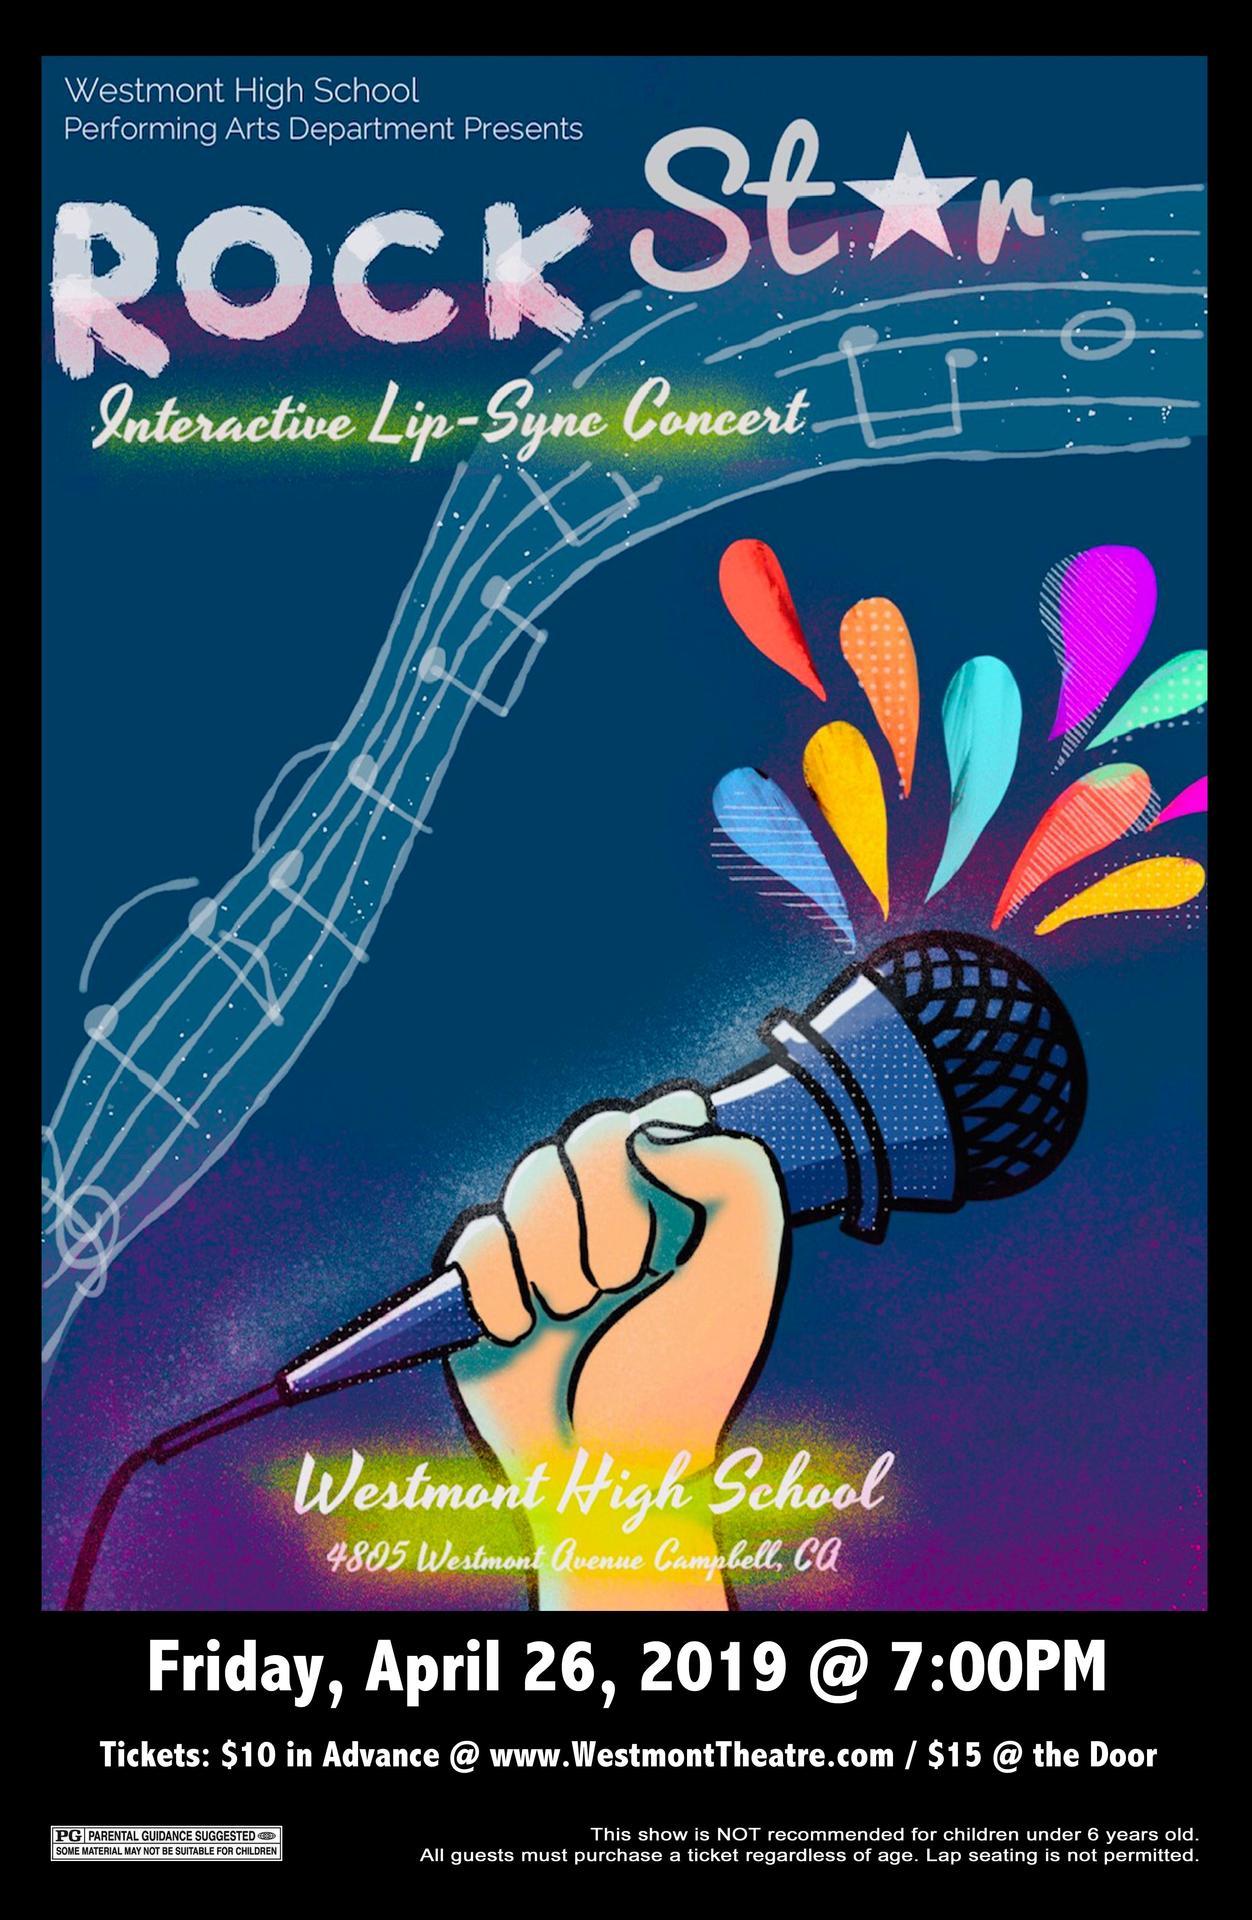 rockstar westmont high school performance